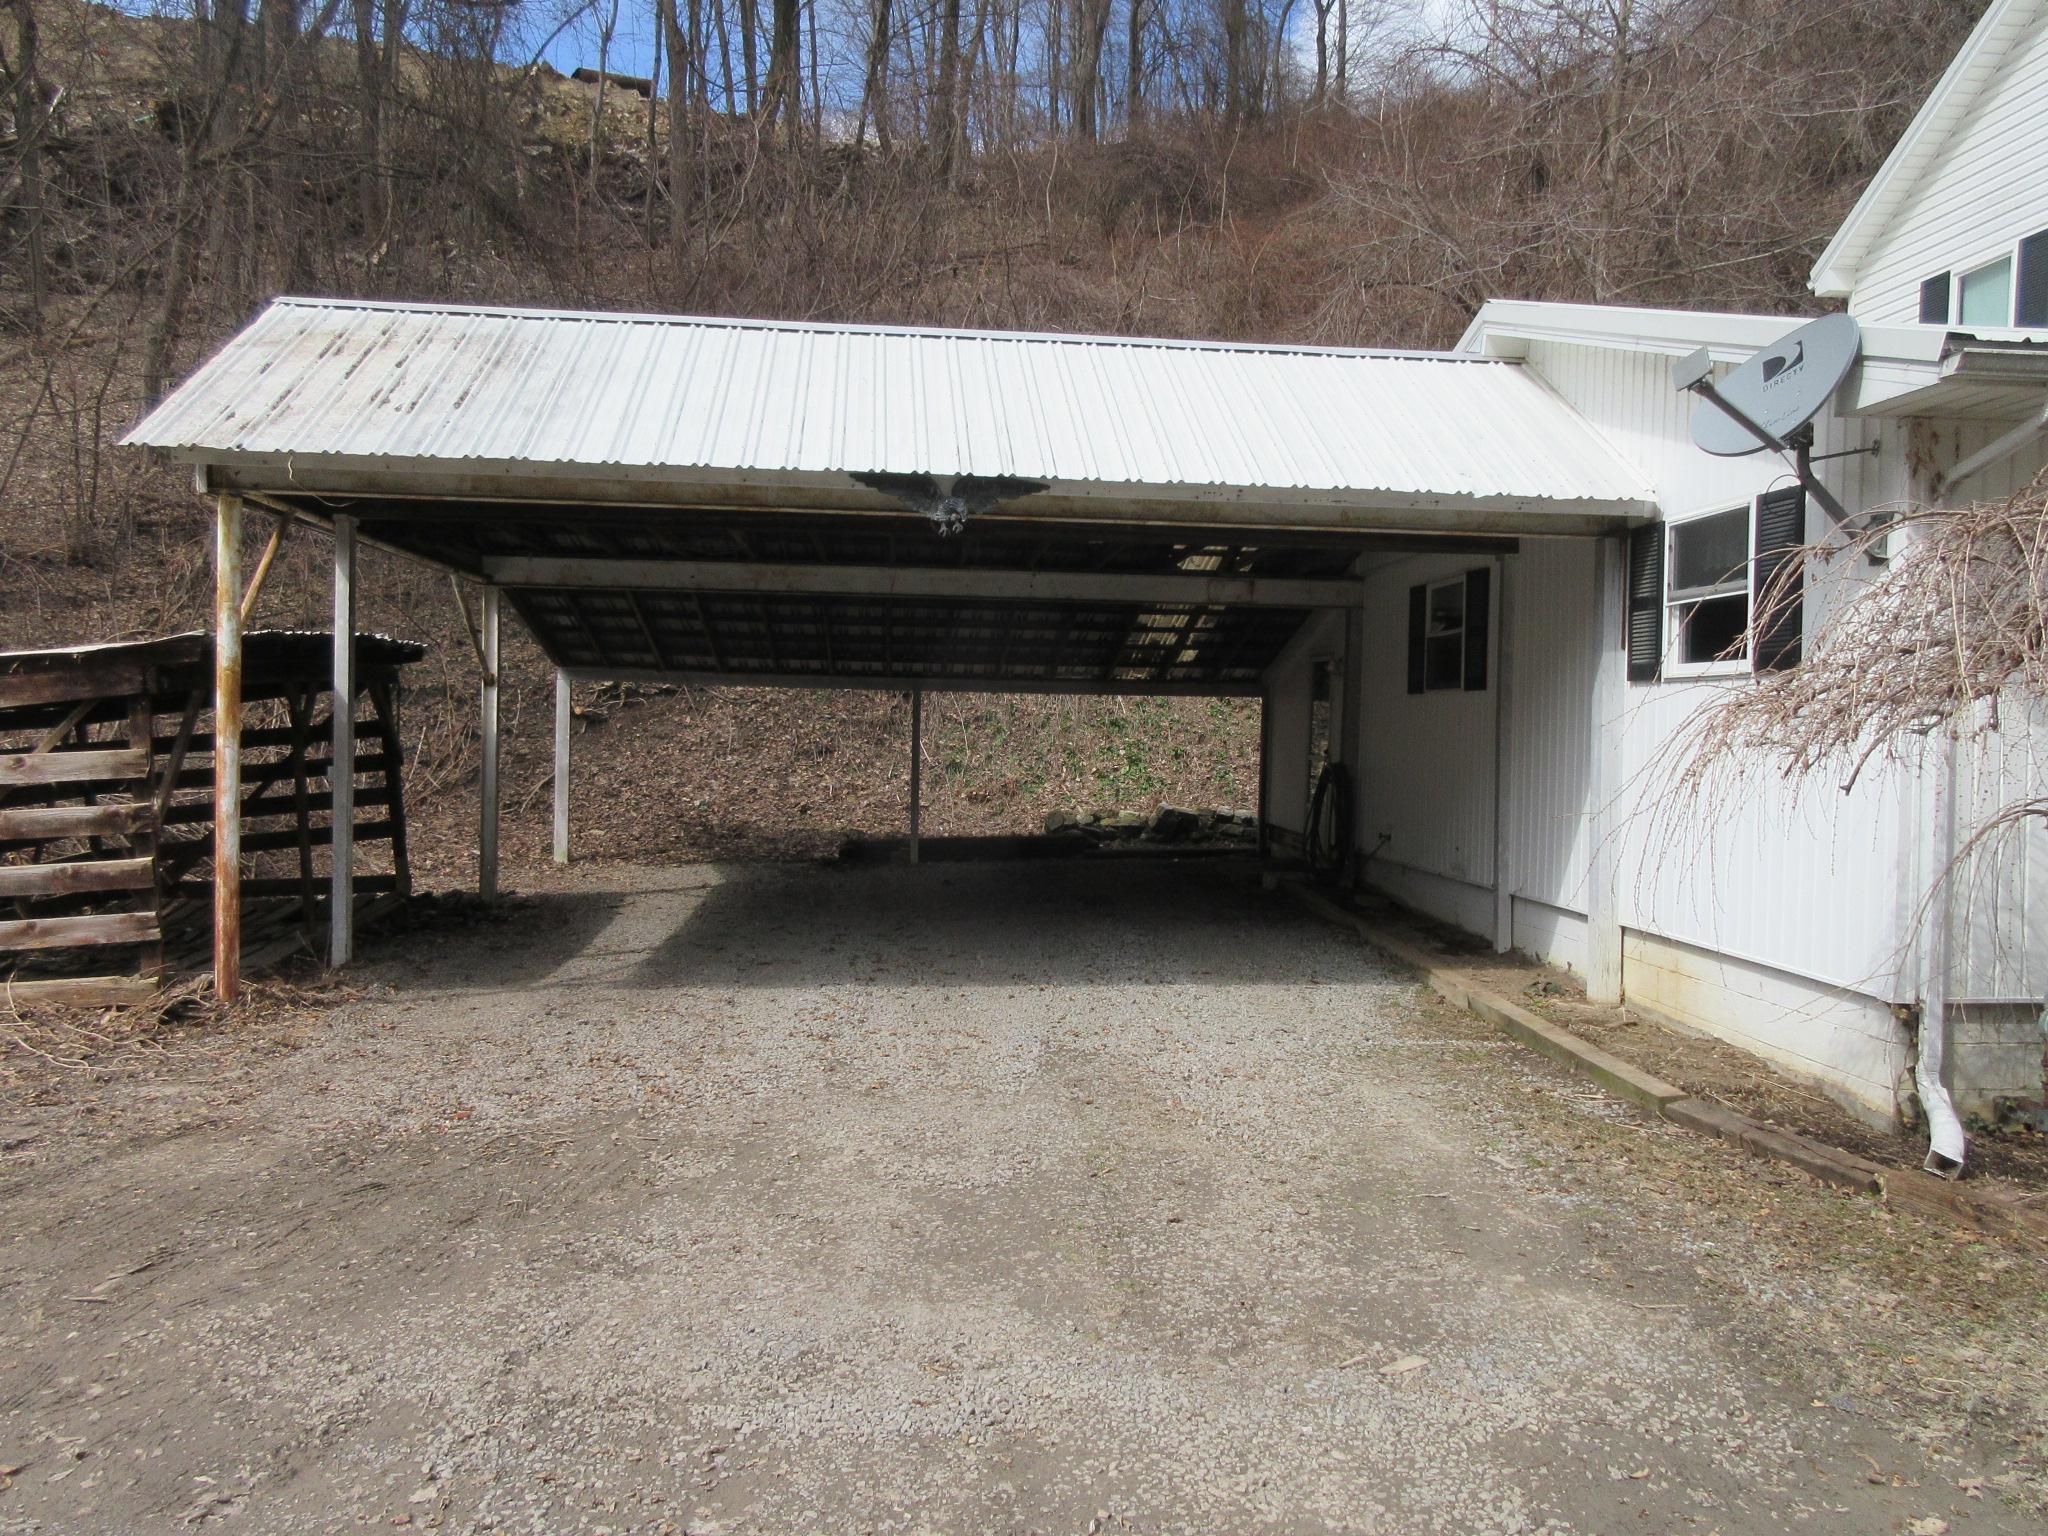 177 Vineyard Lane Duncansville Carport pic